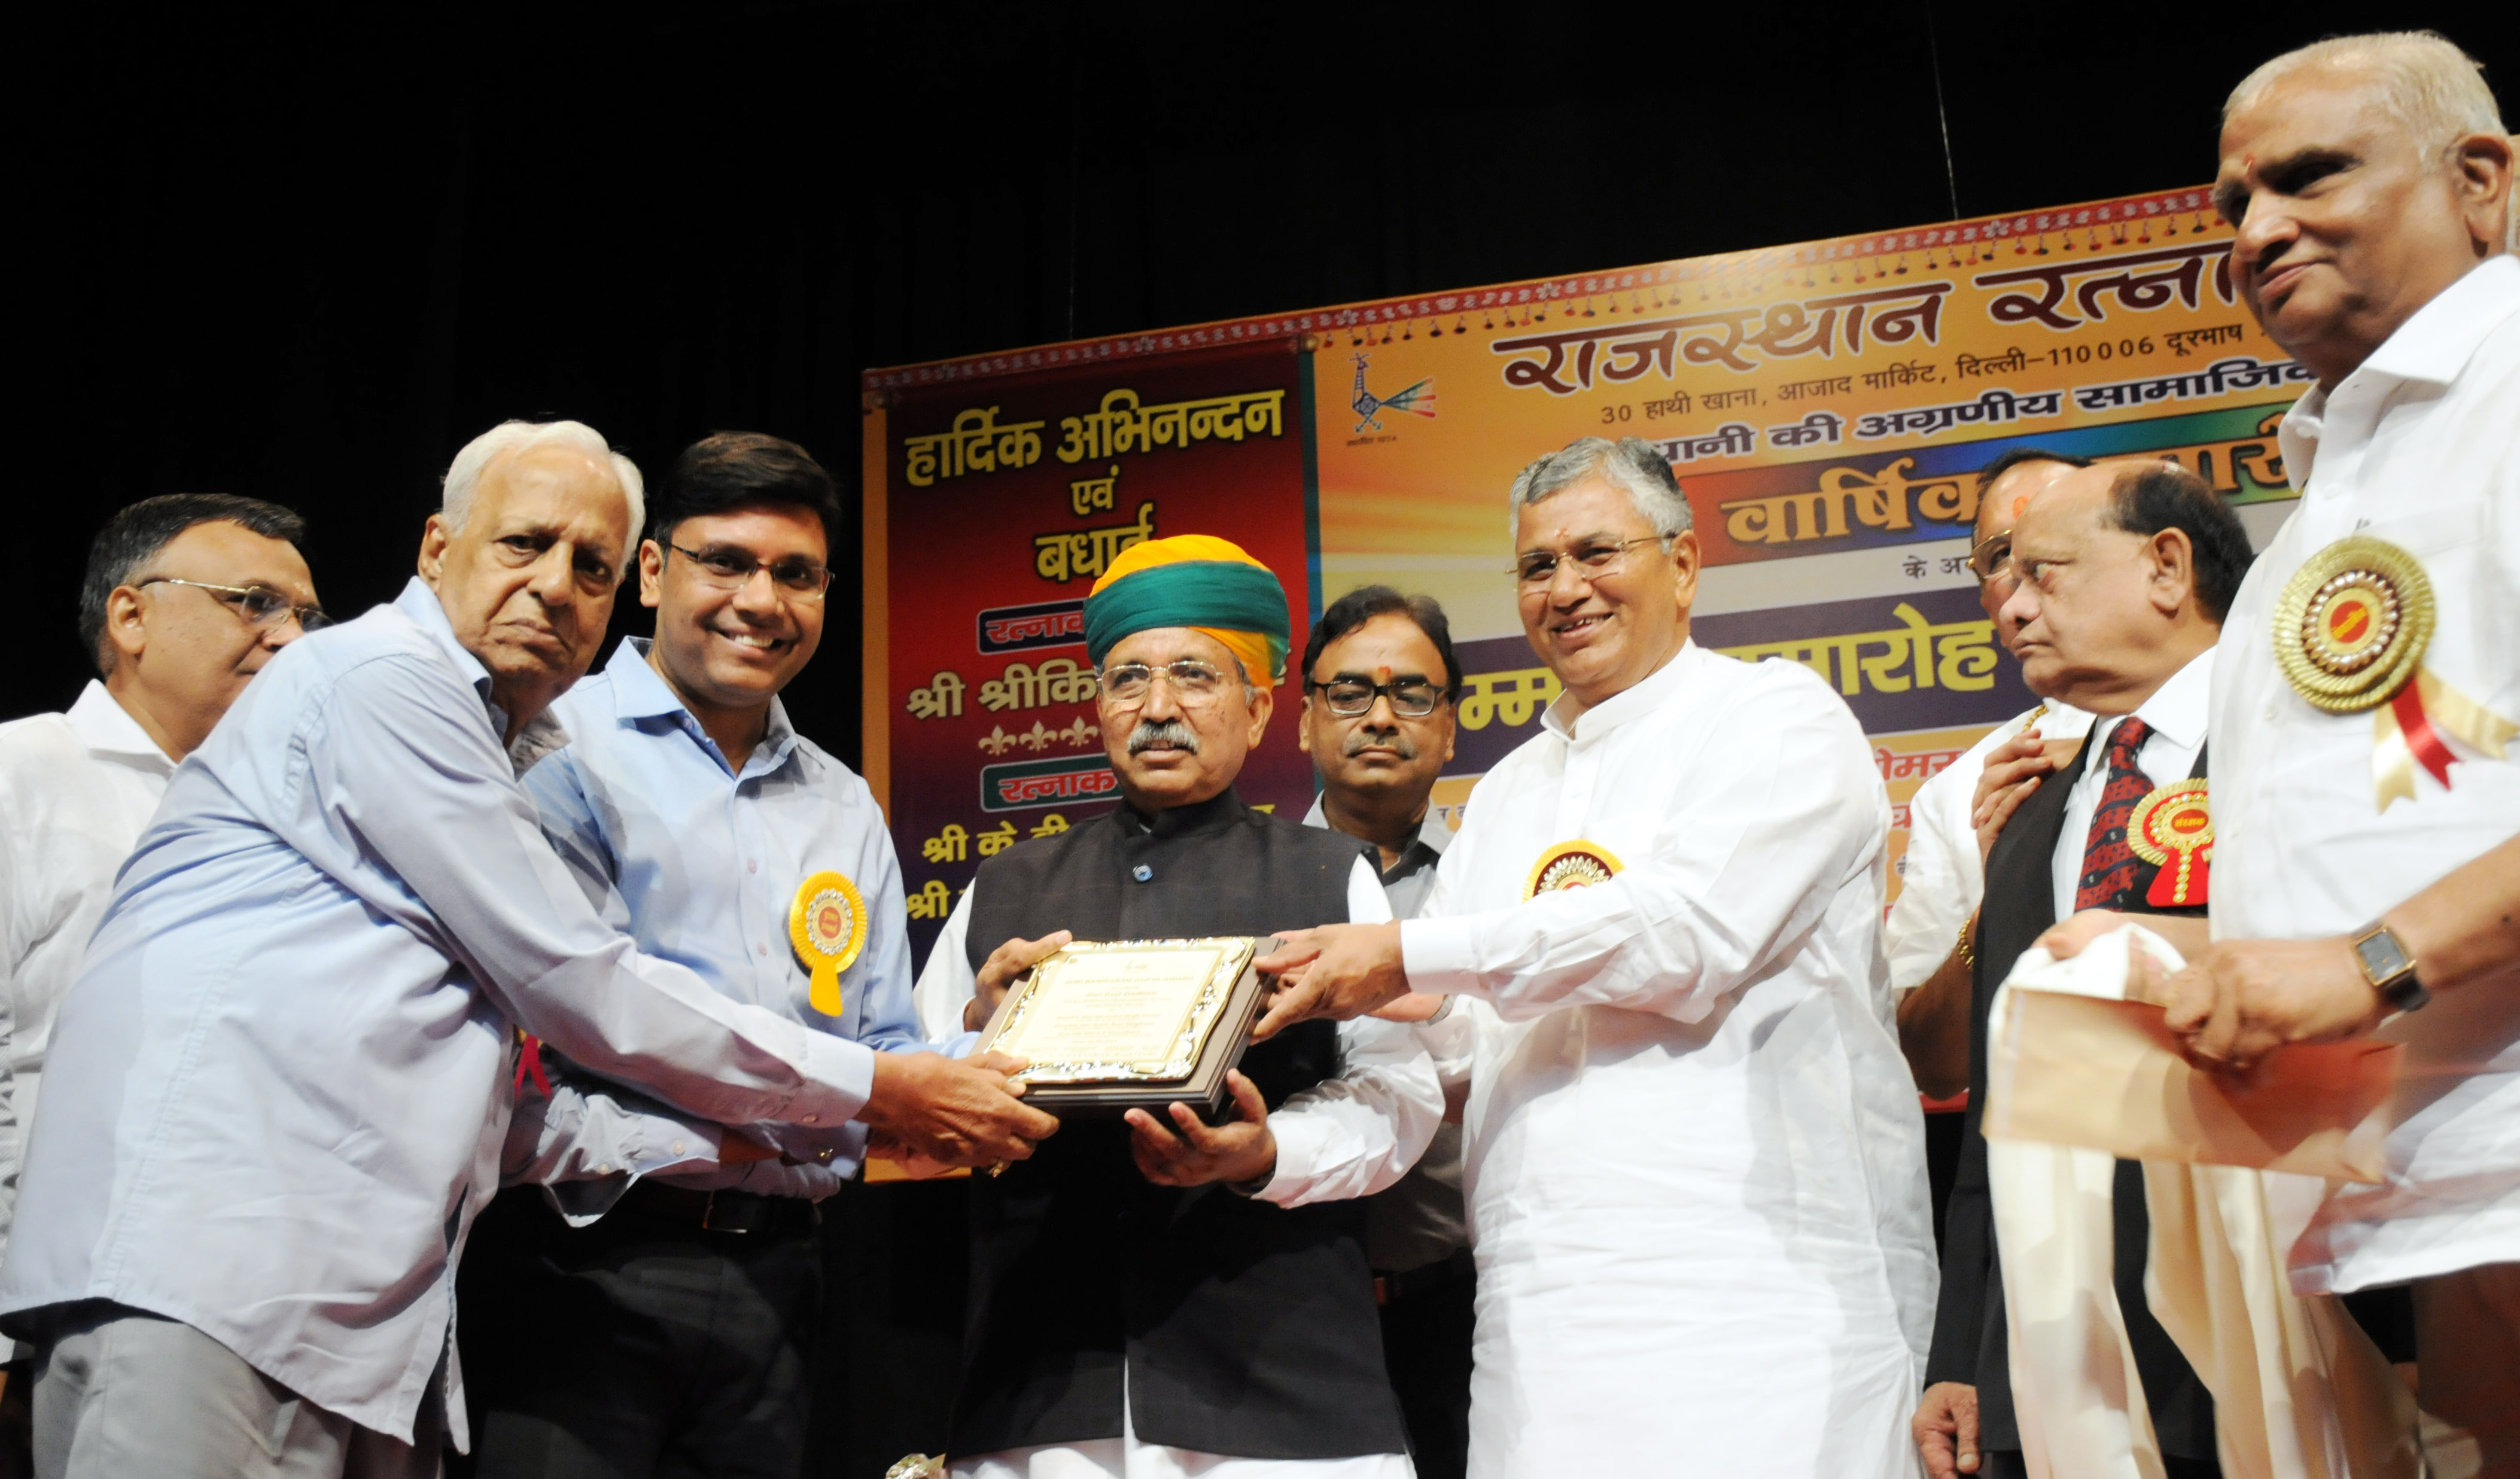 Annual Festival, Rajasthan Ratnakar, Delhi, Scholarship, Students